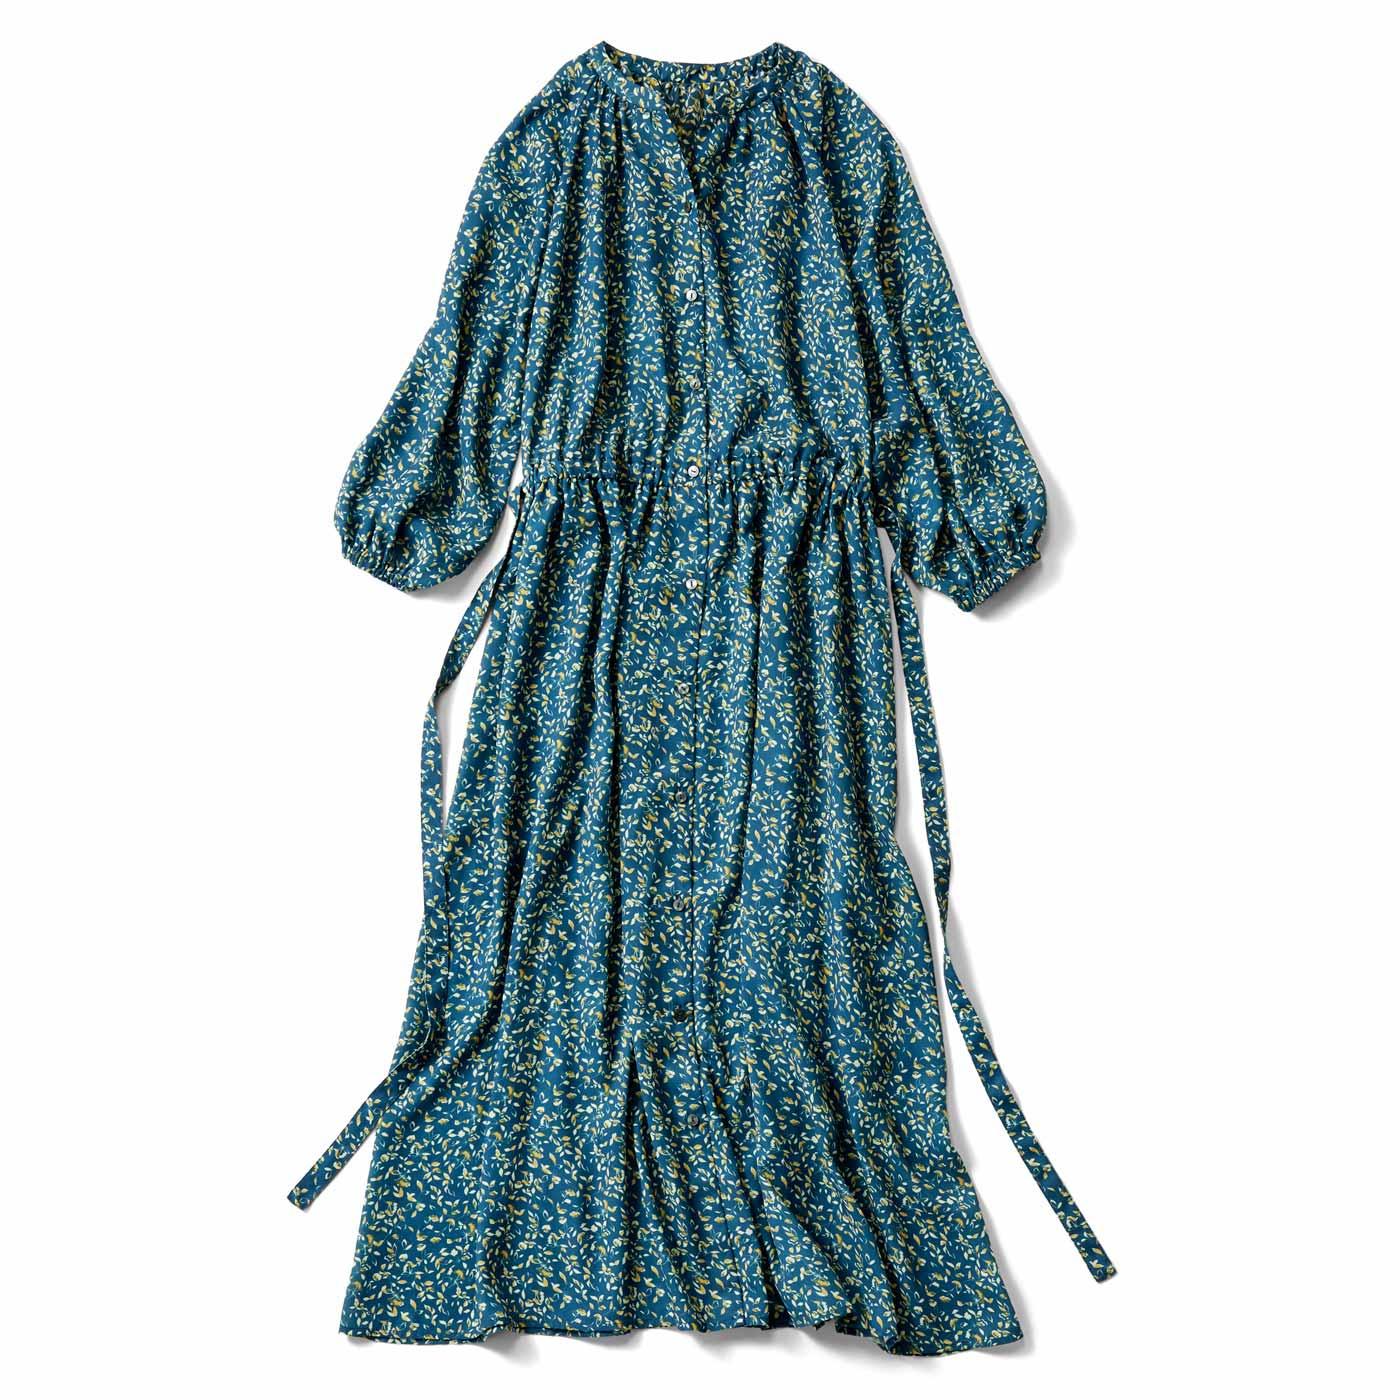 IEDIT[イディット] 大人フラワープリントのロングシャツドレス〈ダークグリーン〉